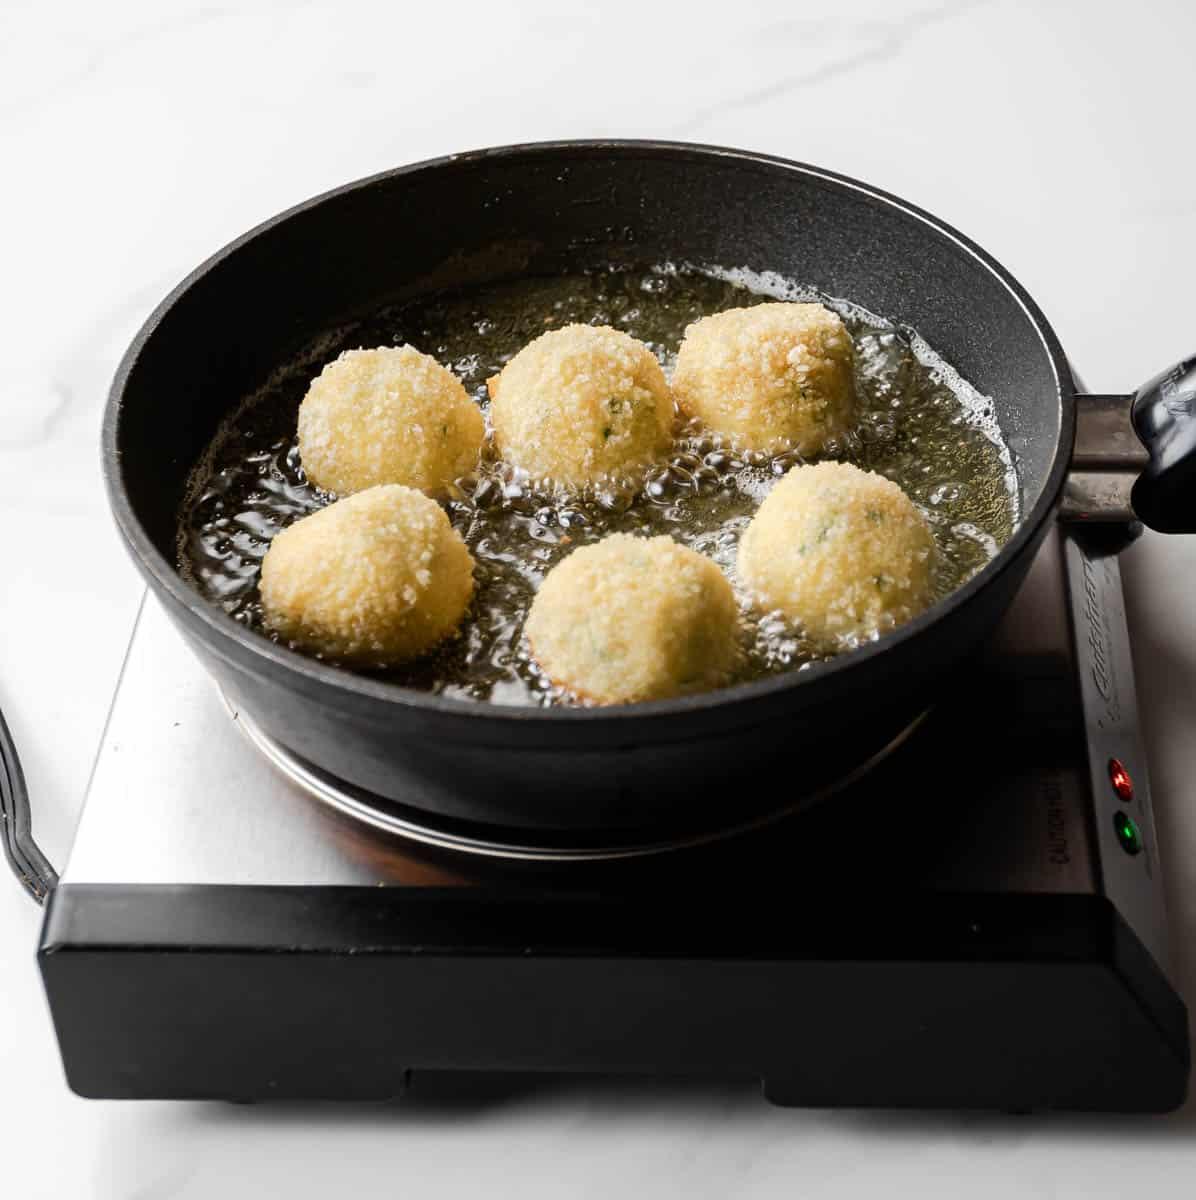 frying mashed potato balls.